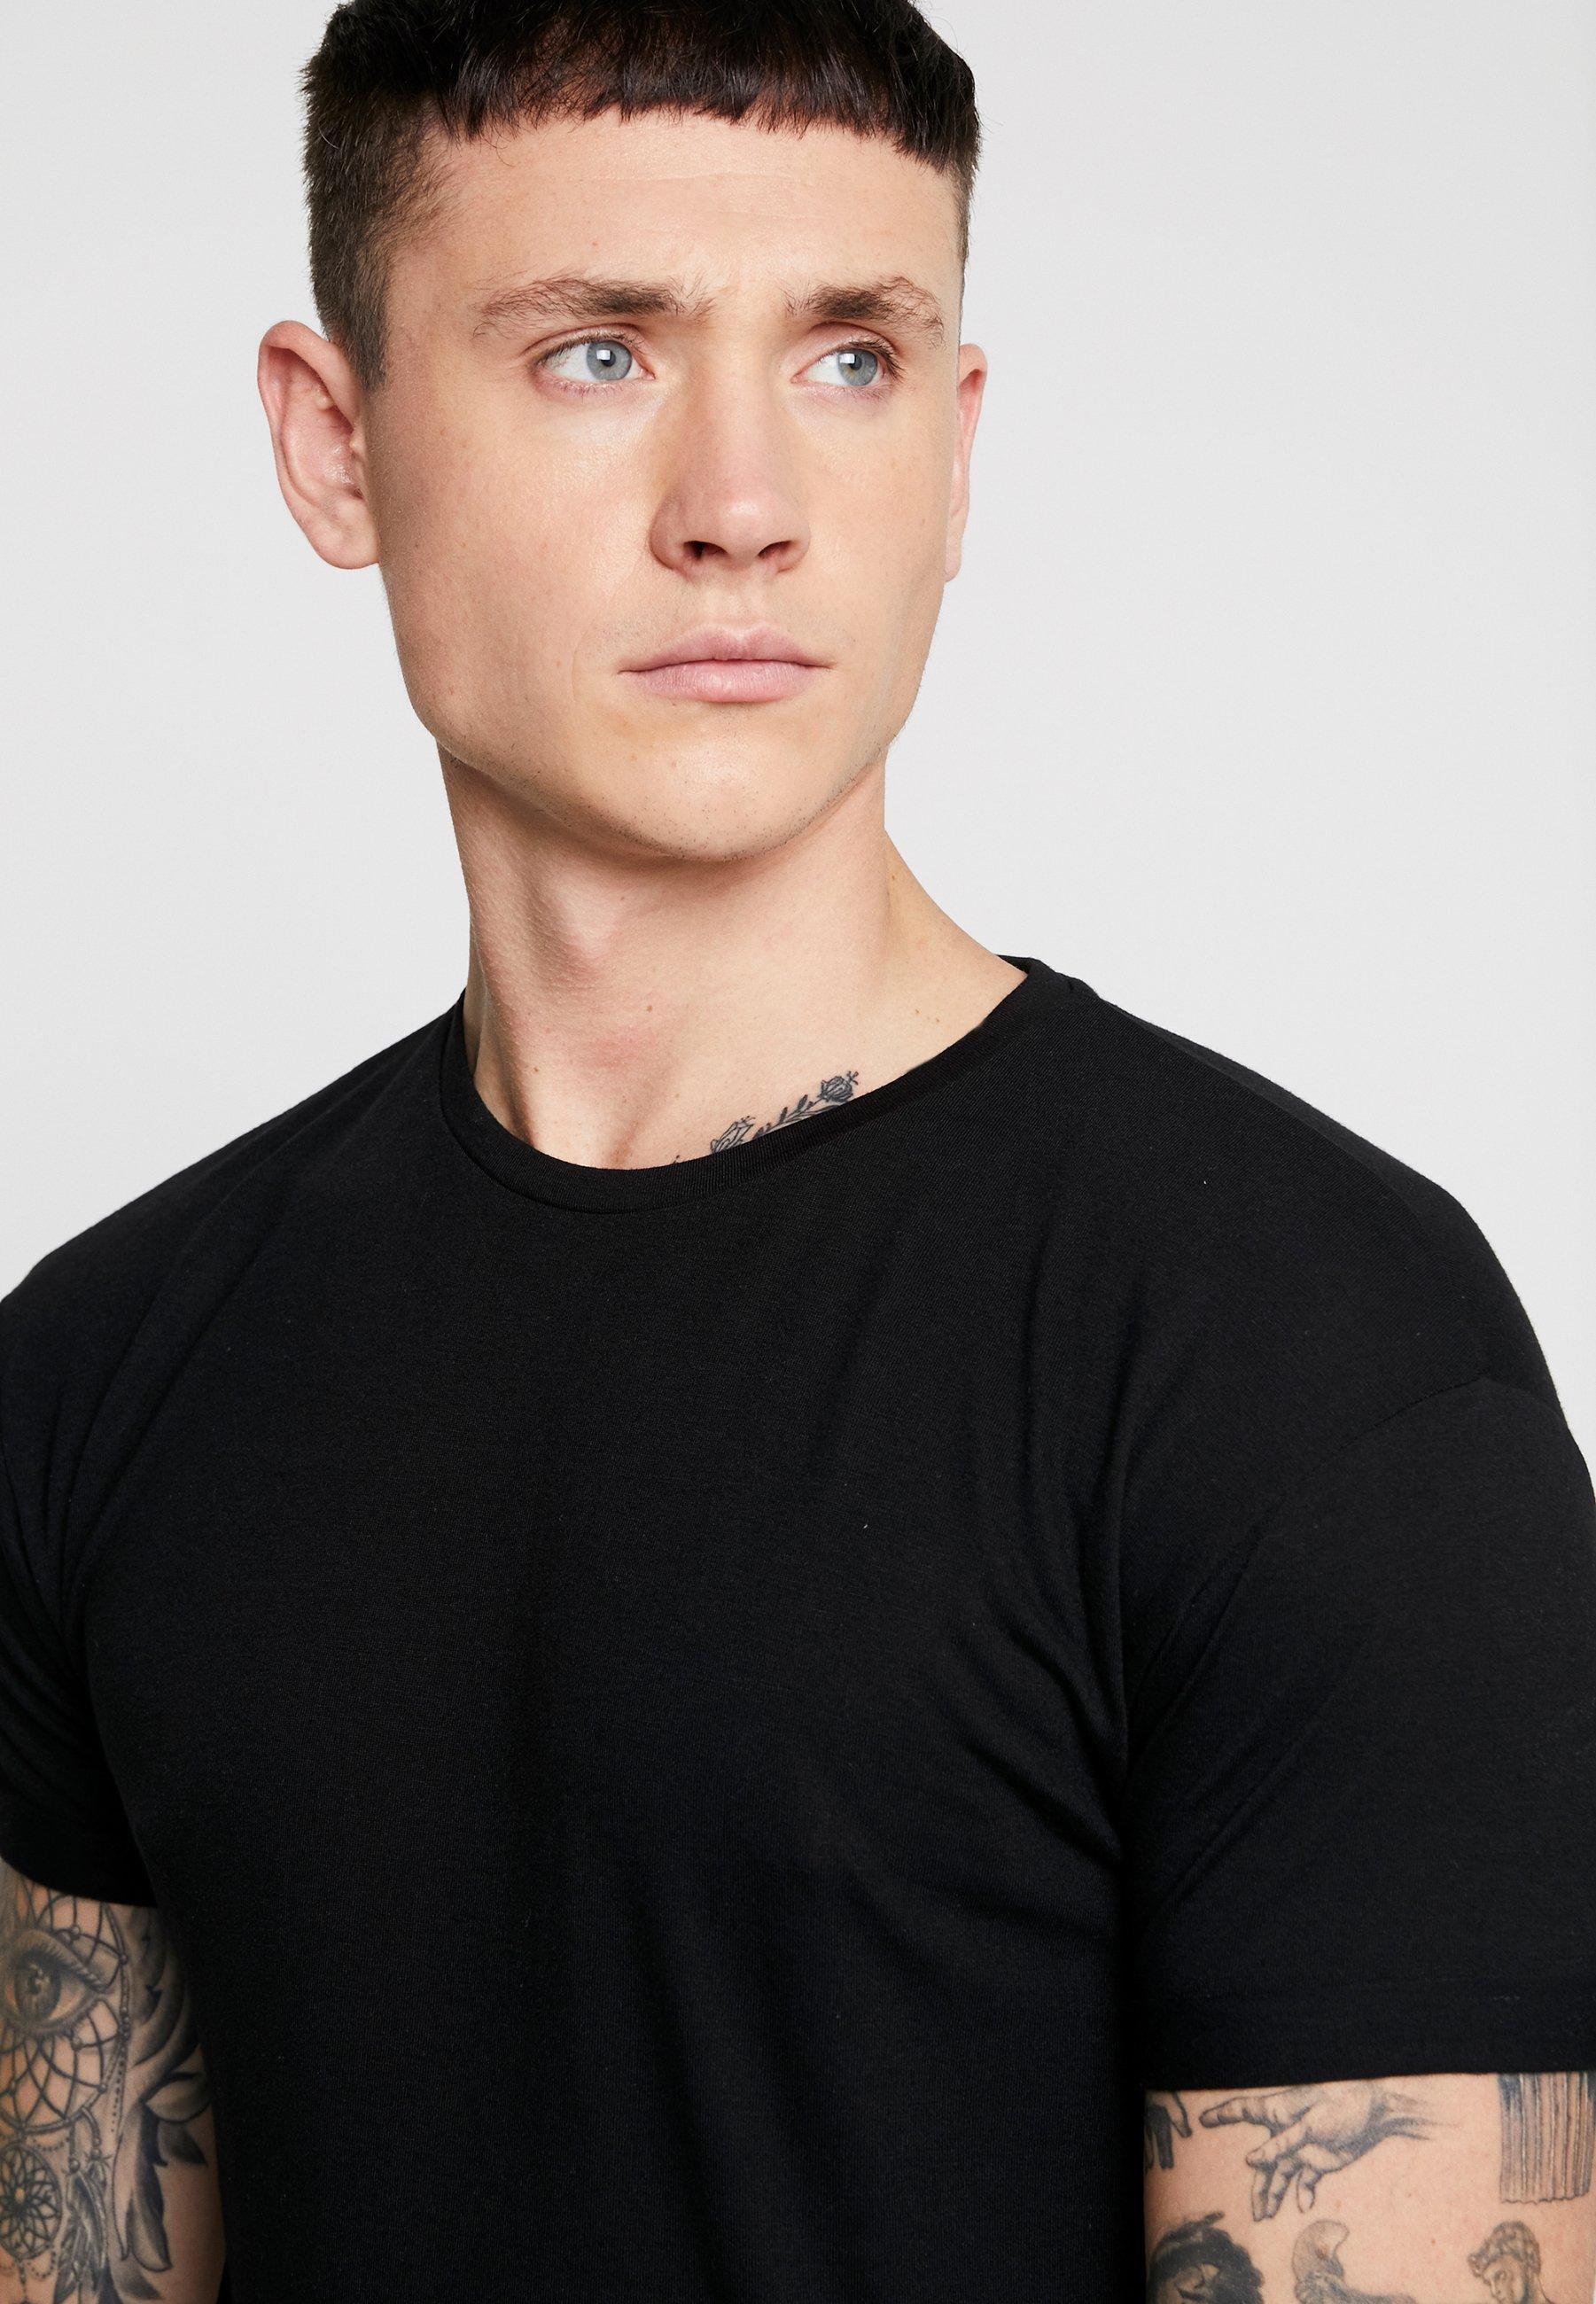 Topman SCOTTY 2 PACK - Basic T-shirt - black/white gOC1i